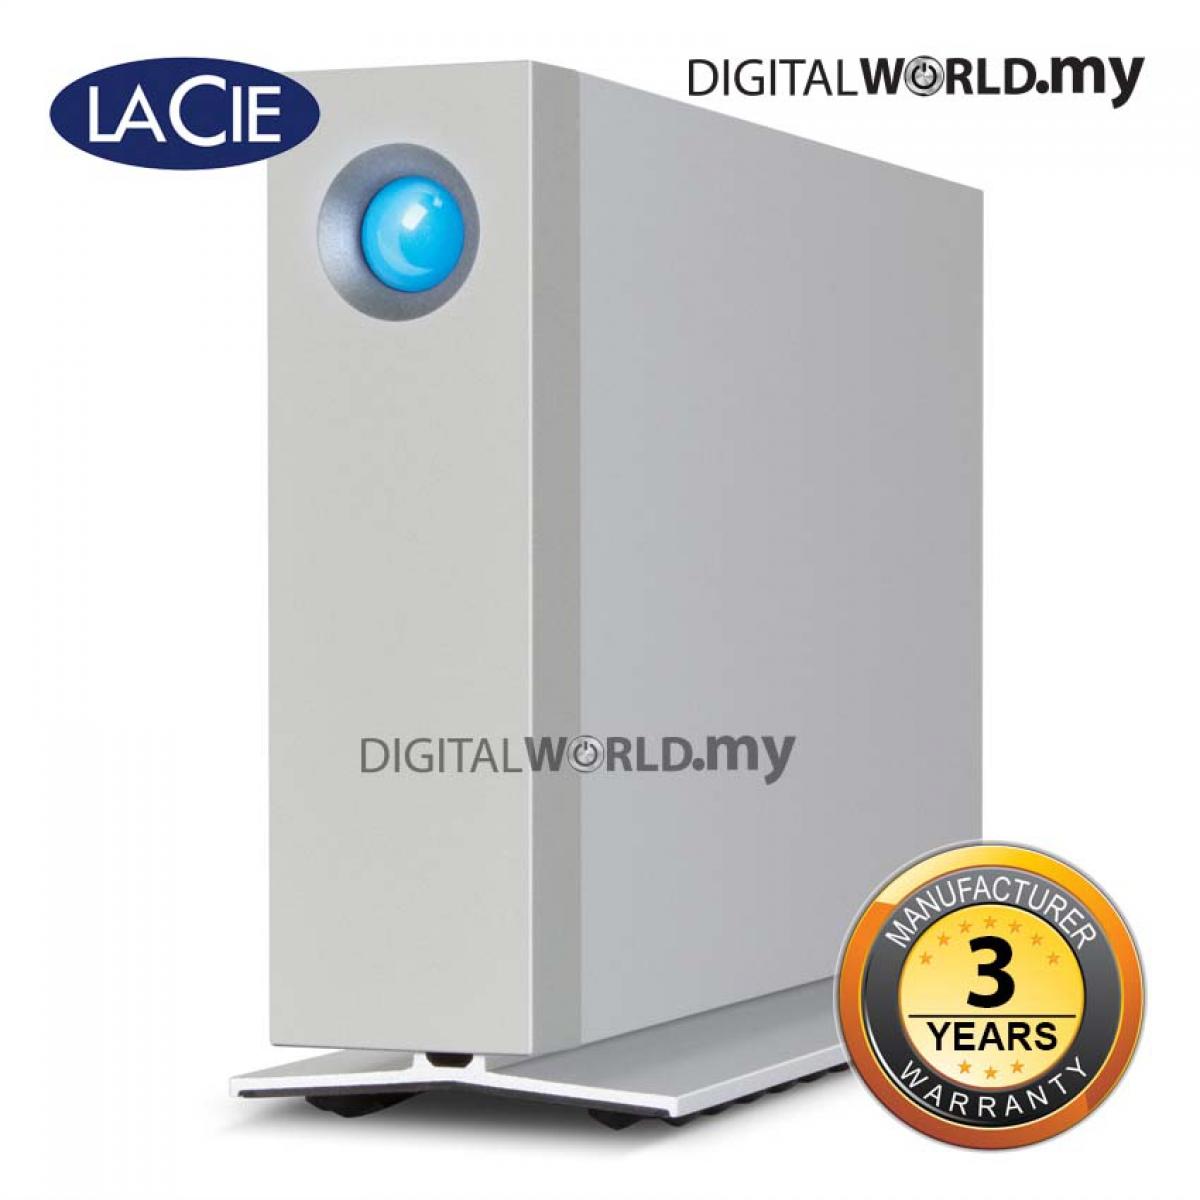 LaCie 3TB-5TB d2 v3 USB 3.0 Desktop Storage. ‹ ›